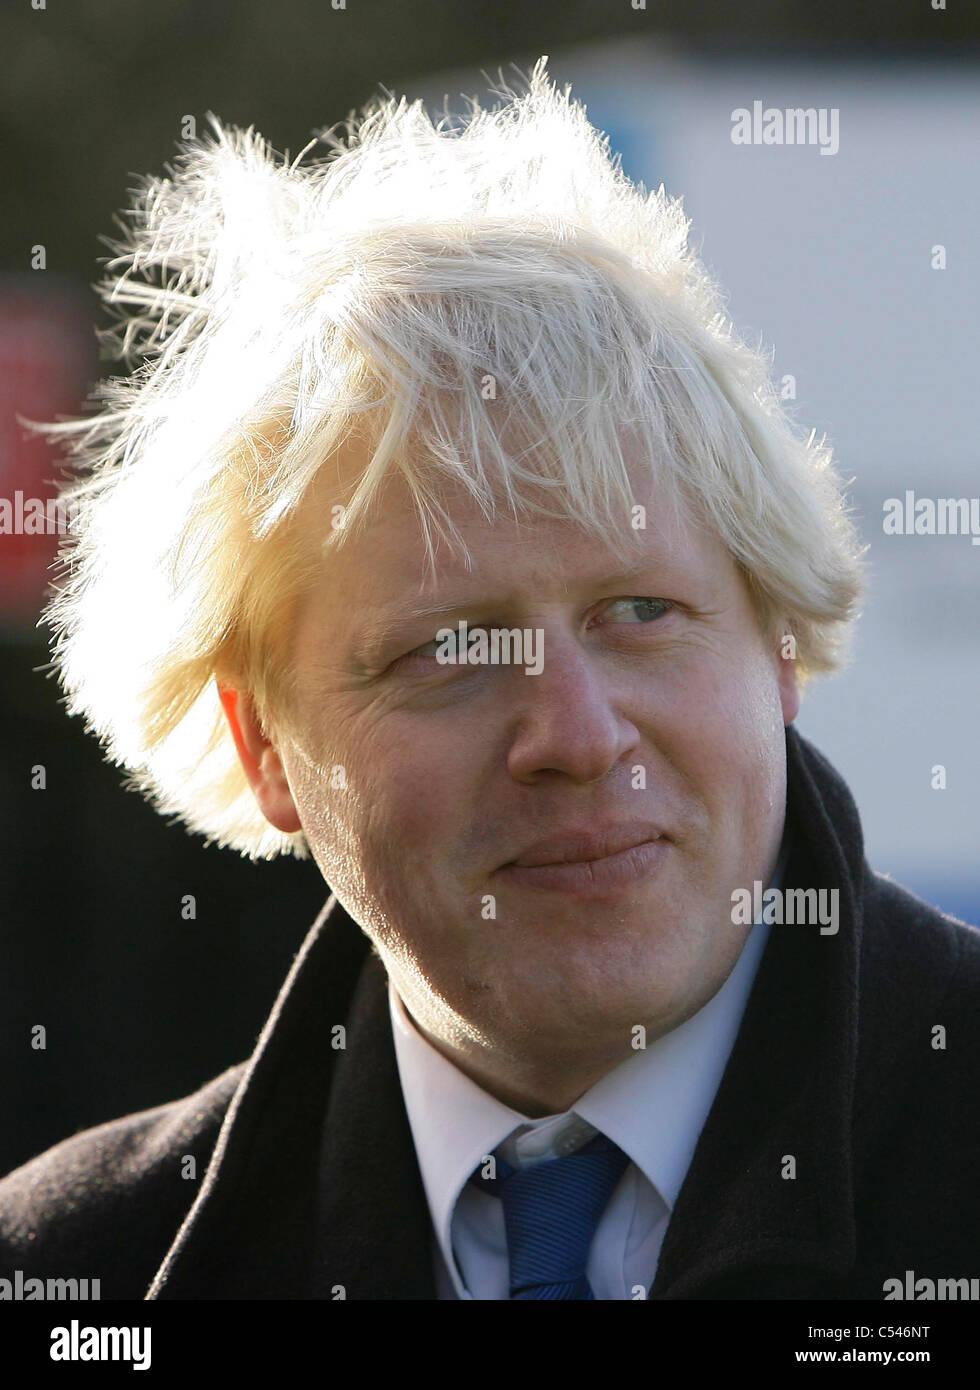 London Mayor Boris Johnson. Picture by James Boardman. - Stock Image